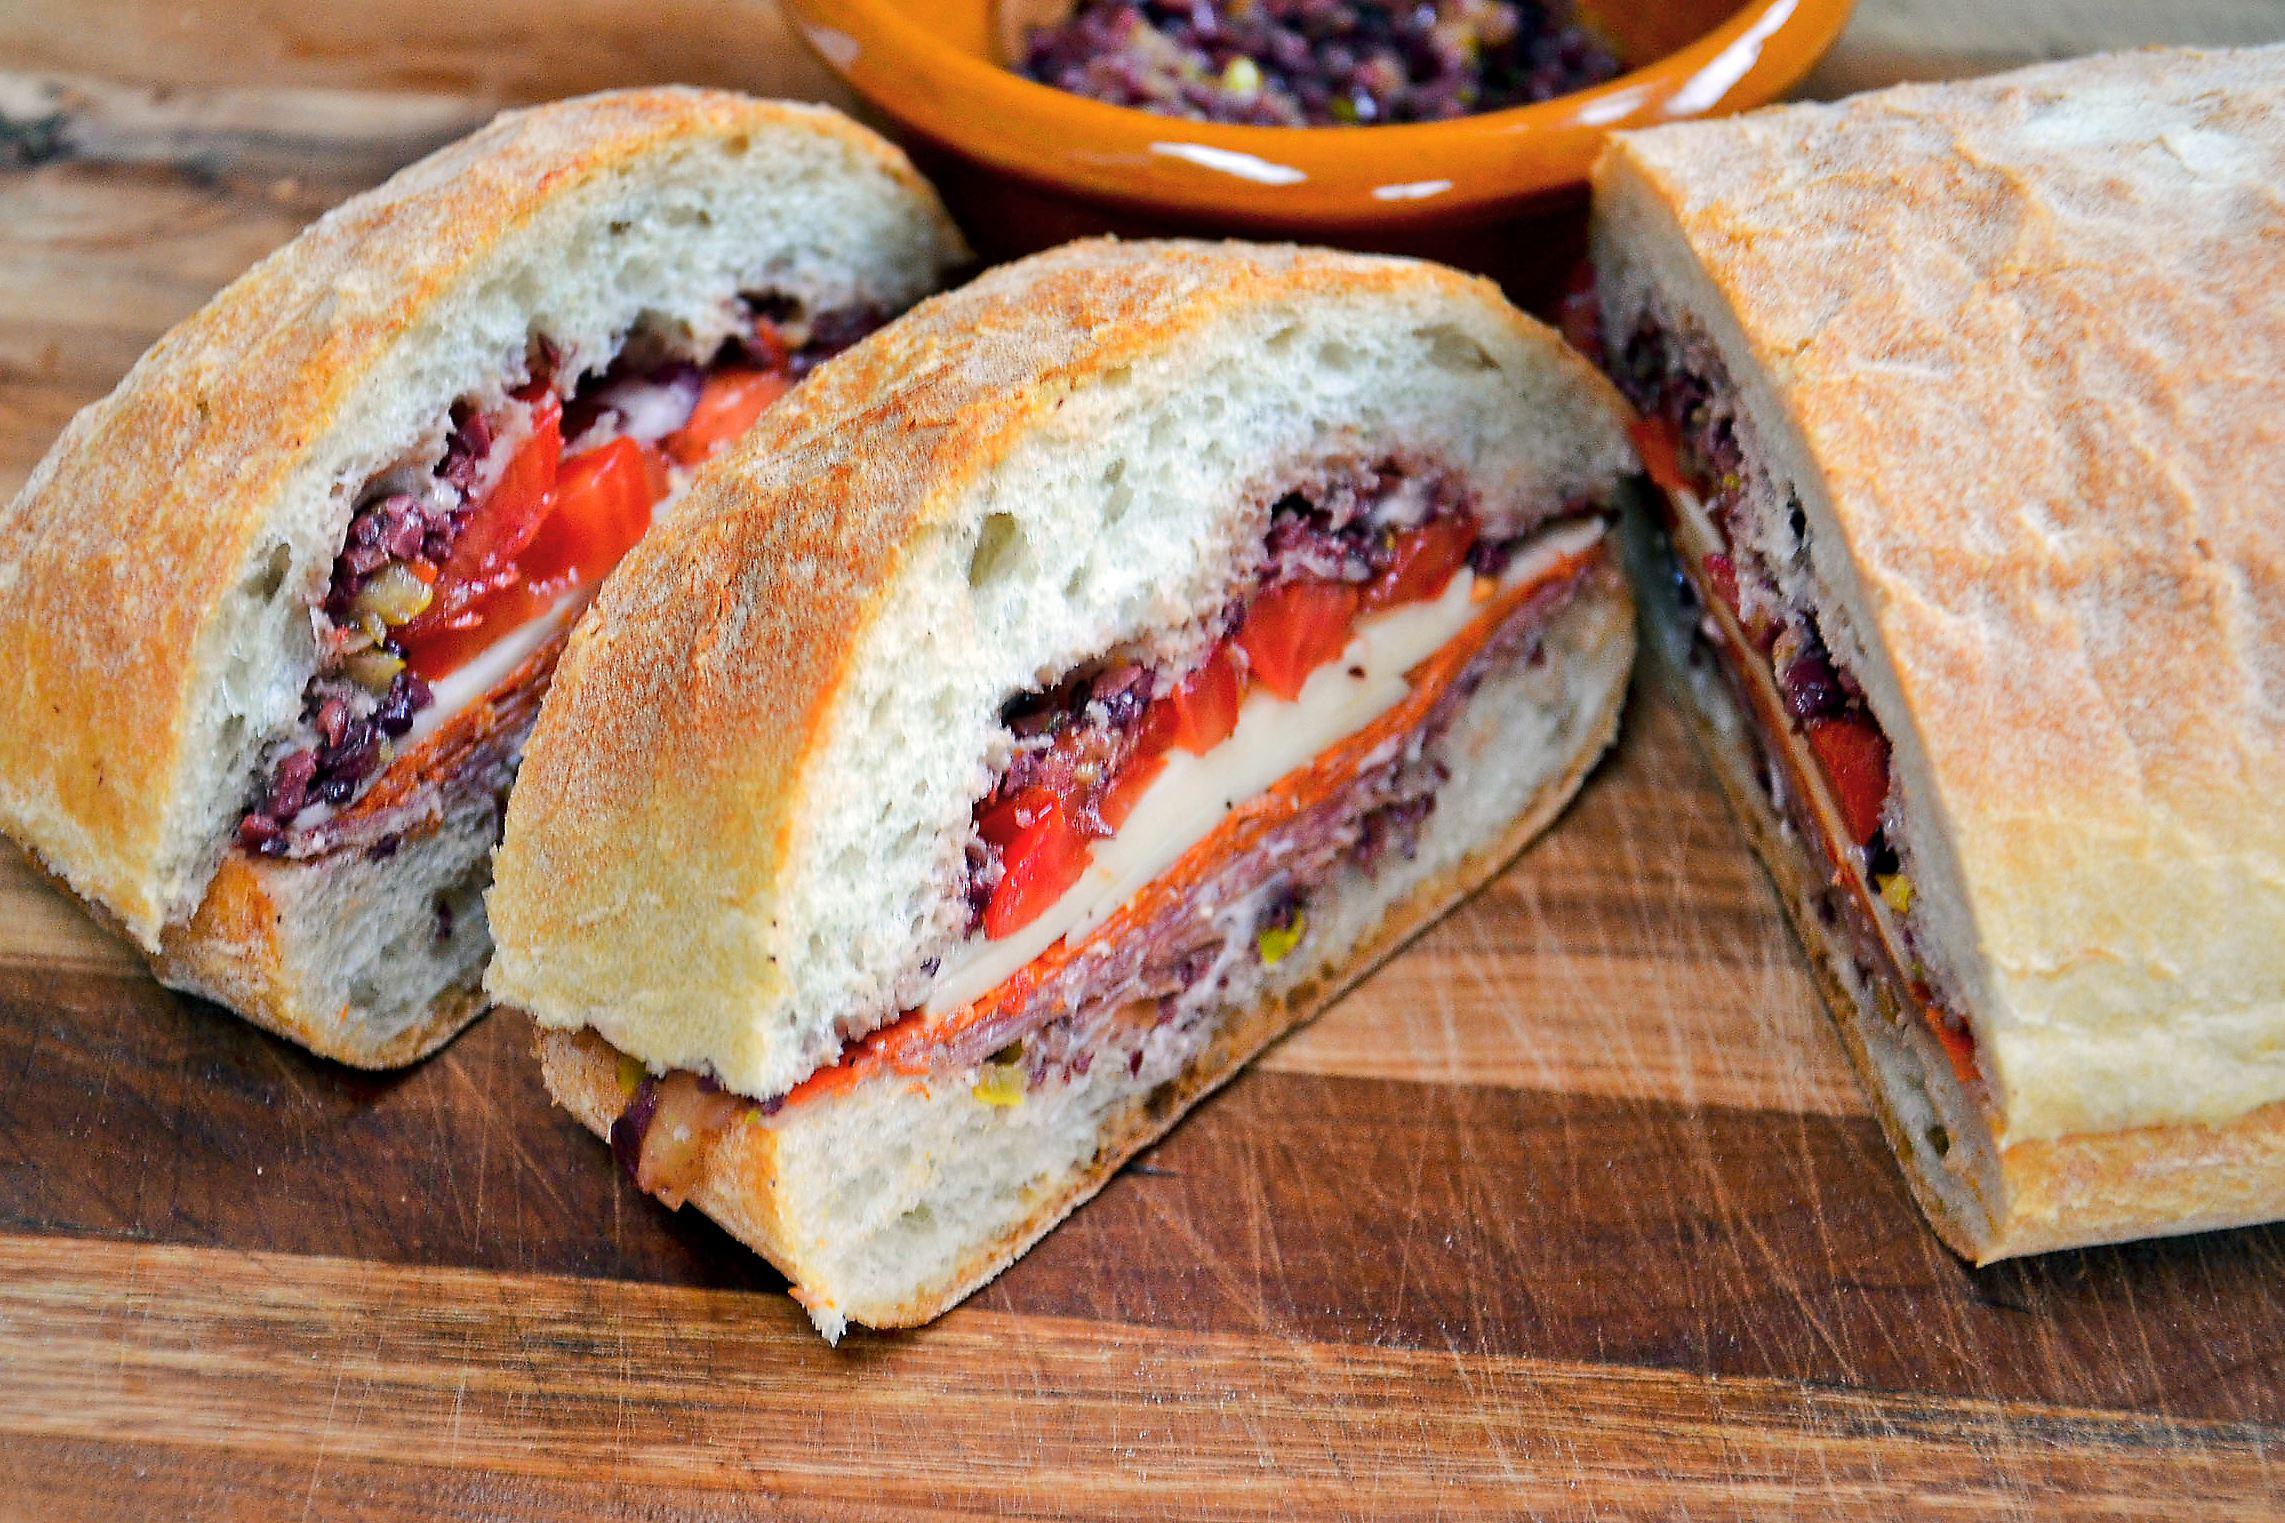 Super-Submarine-Sandwich-rubin-1-1 Super Submarine Sandwich with Olive-Pepper Relish.